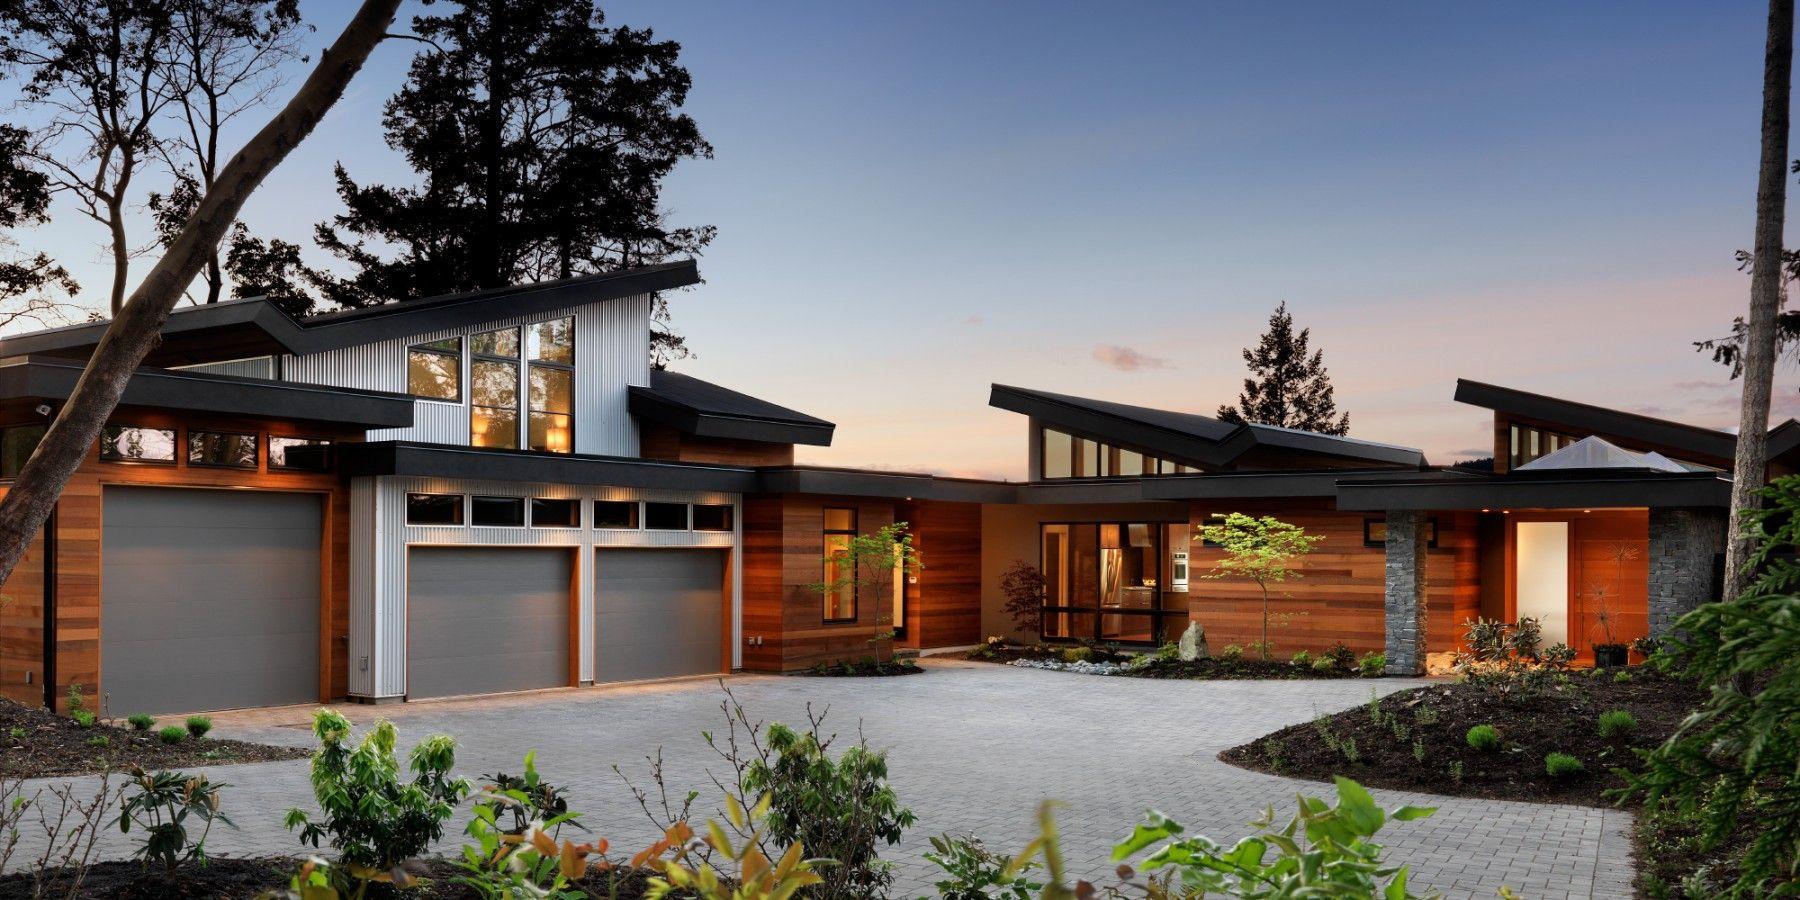 Kb Design Keith Baker Custom Home Design Victoria Vancouver Island Contemporary House Plans Modern House Design Architecture House